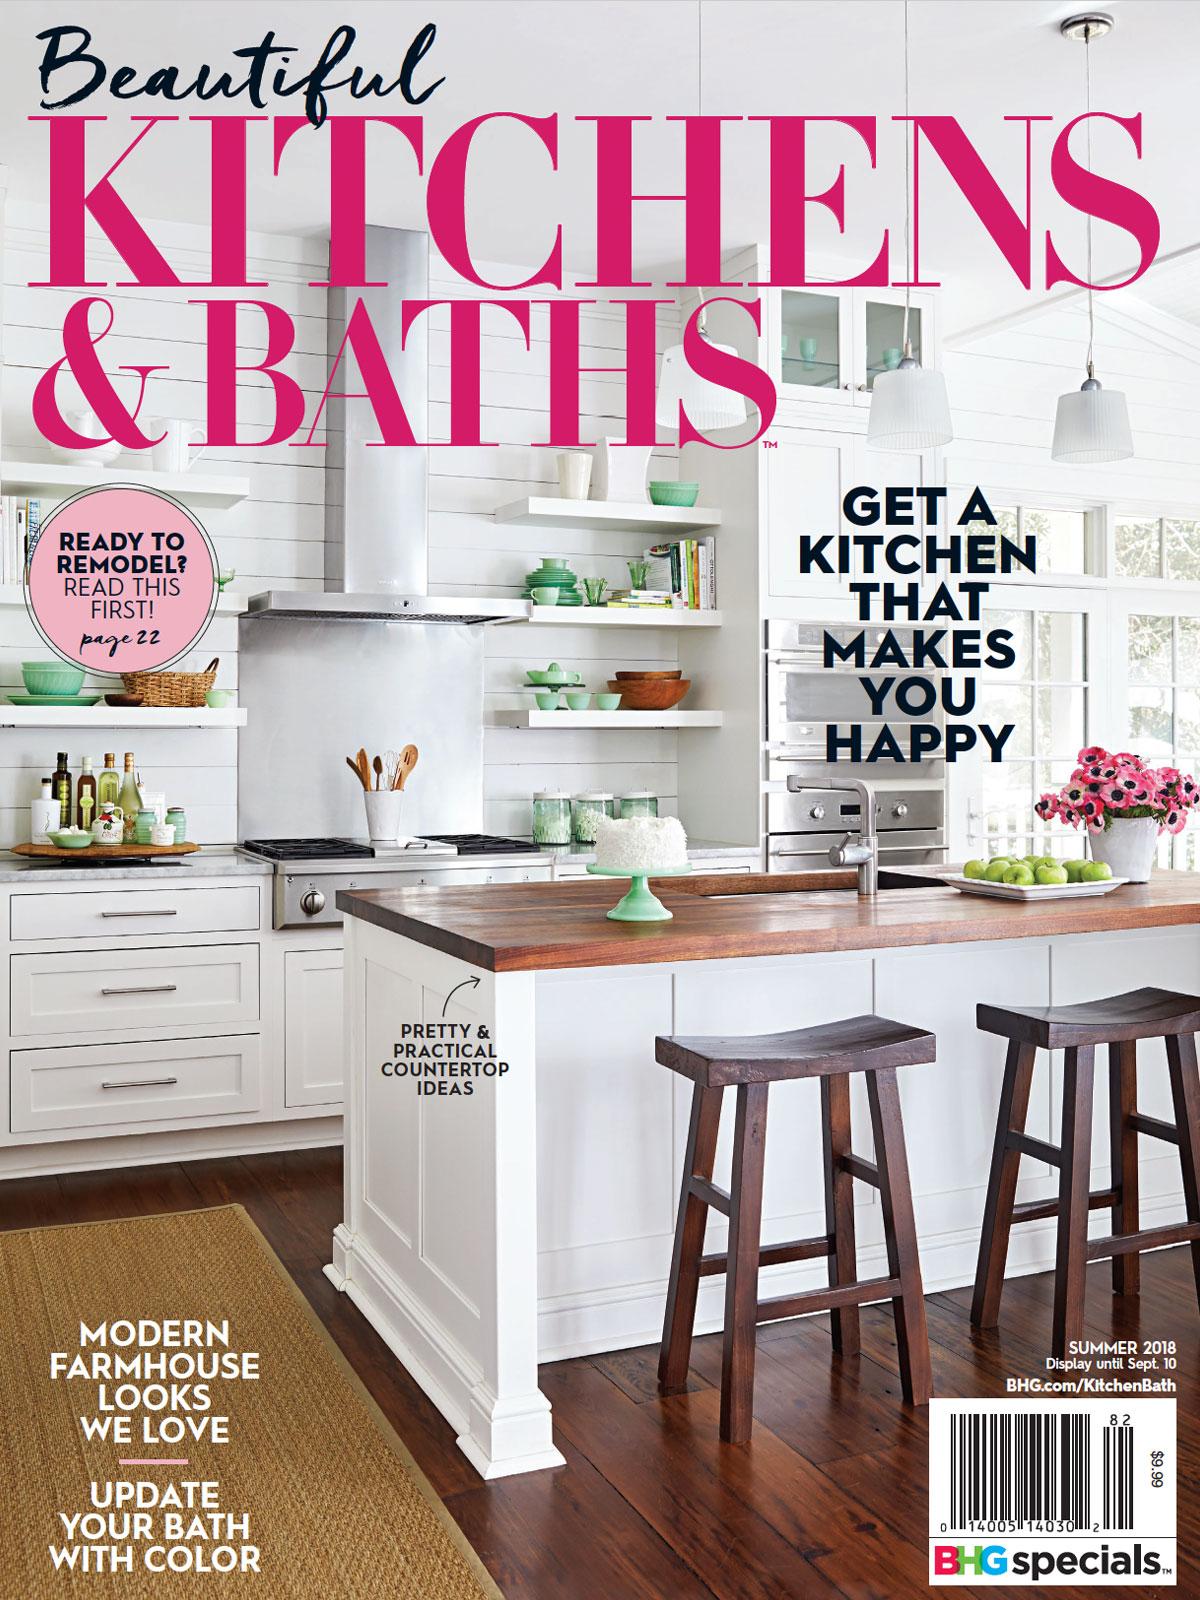 blackband_design_bhg_beautiful_kitchens_baths_cover